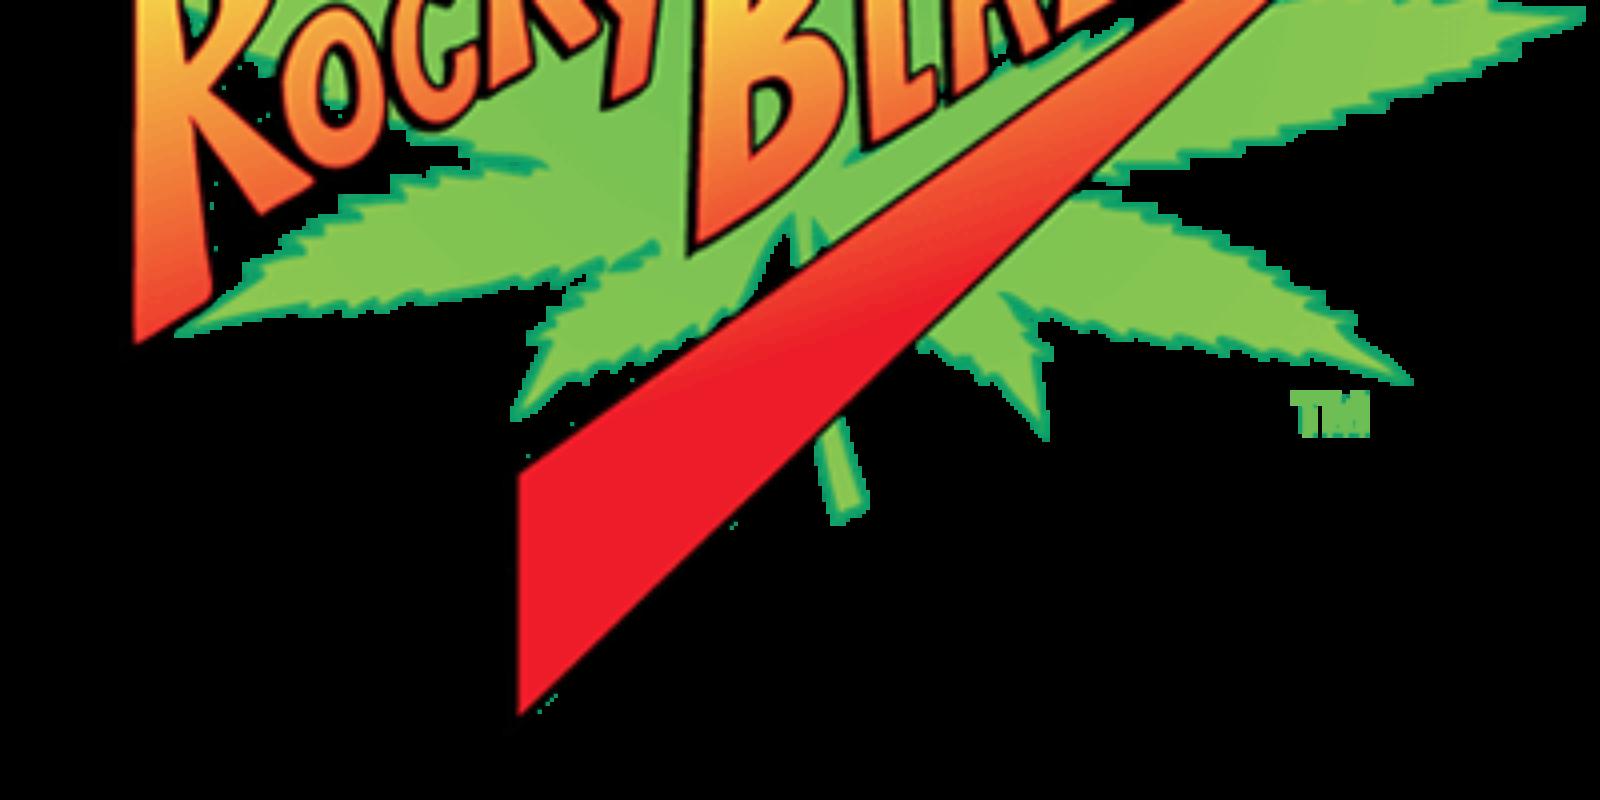 Mountain and sun clipart banner Rocky Mountains Clipart | Free download best Rocky Mountains Clipart ... banner